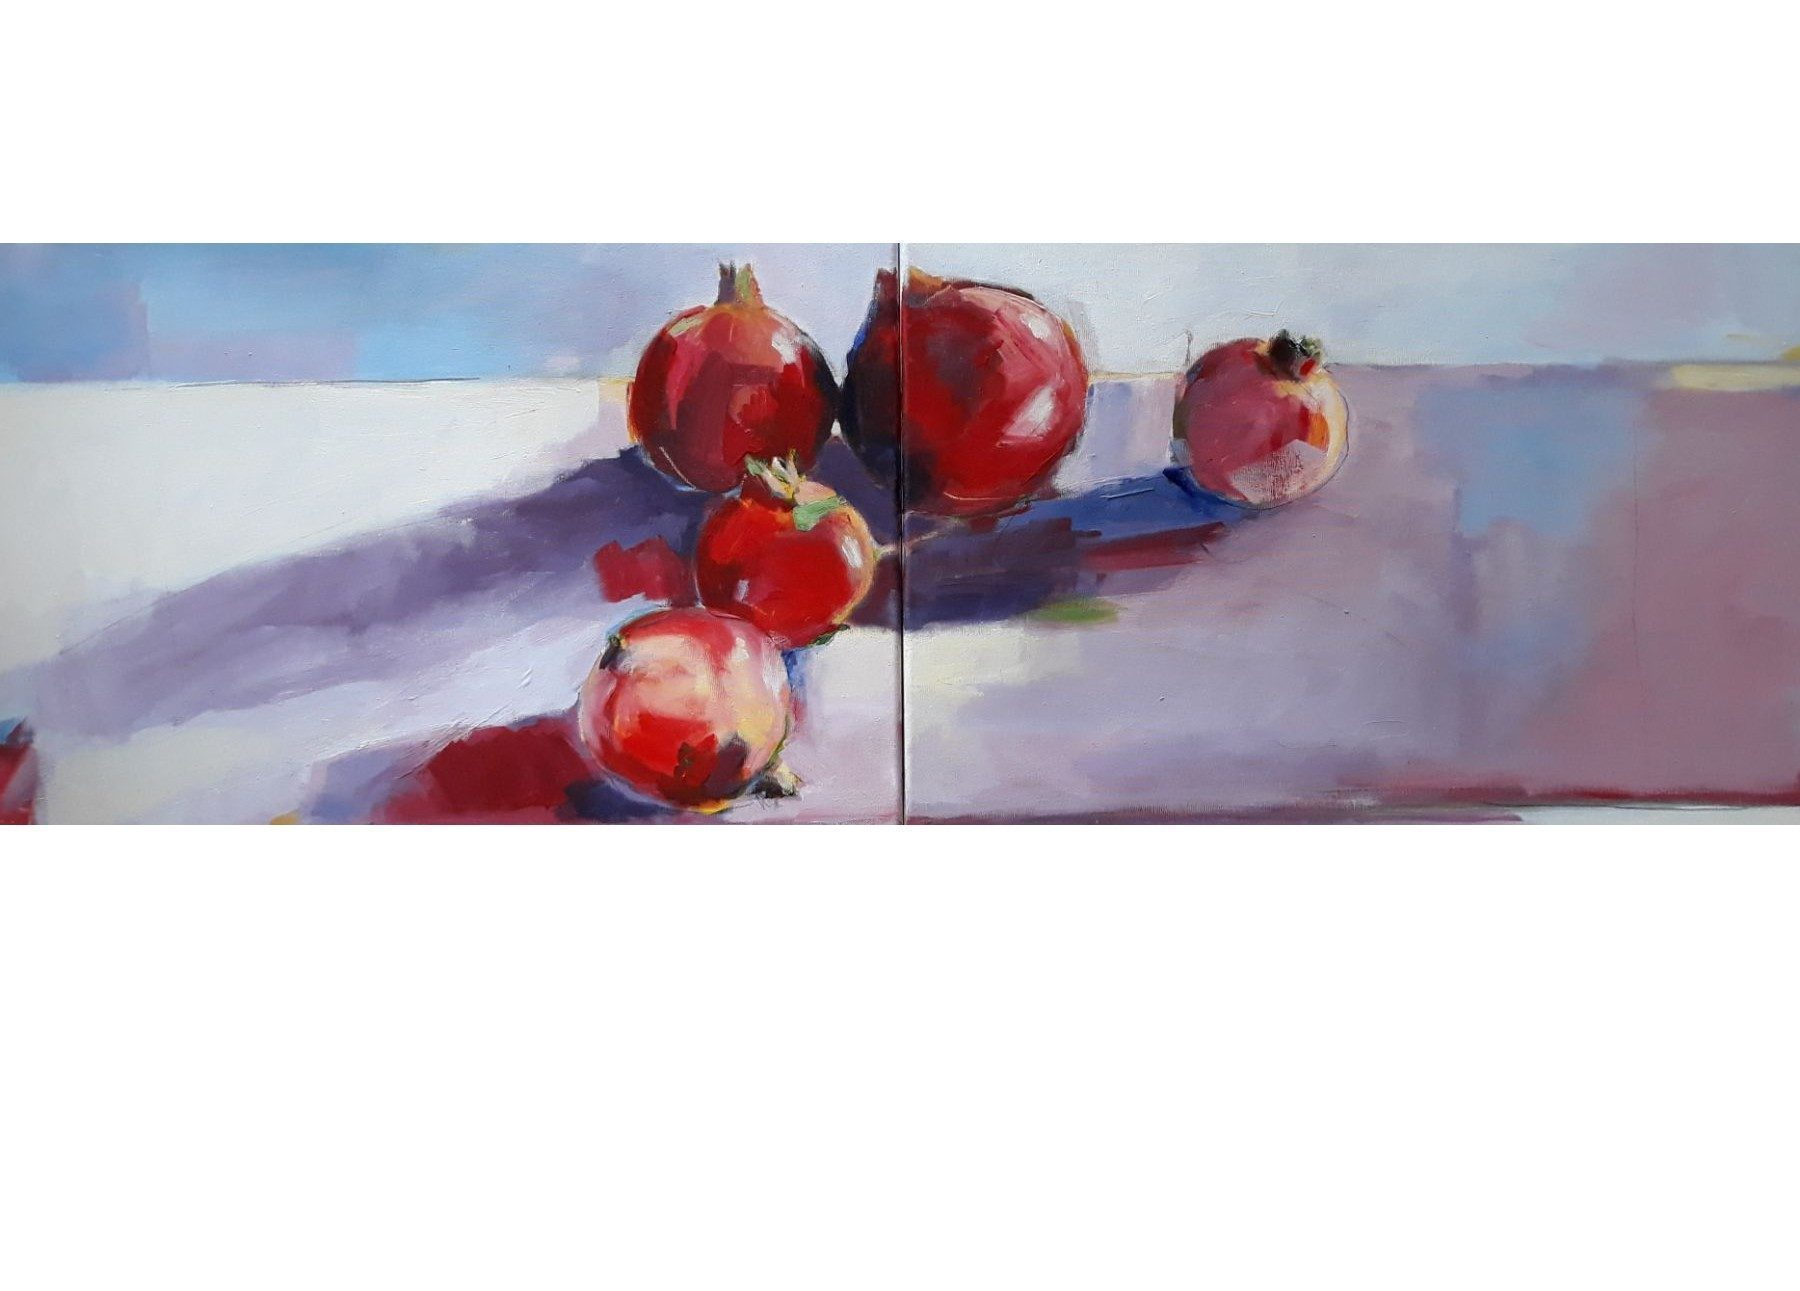 Pomegranates On A Table, - painting, acrylic on canvas by artist Neva Bergemann